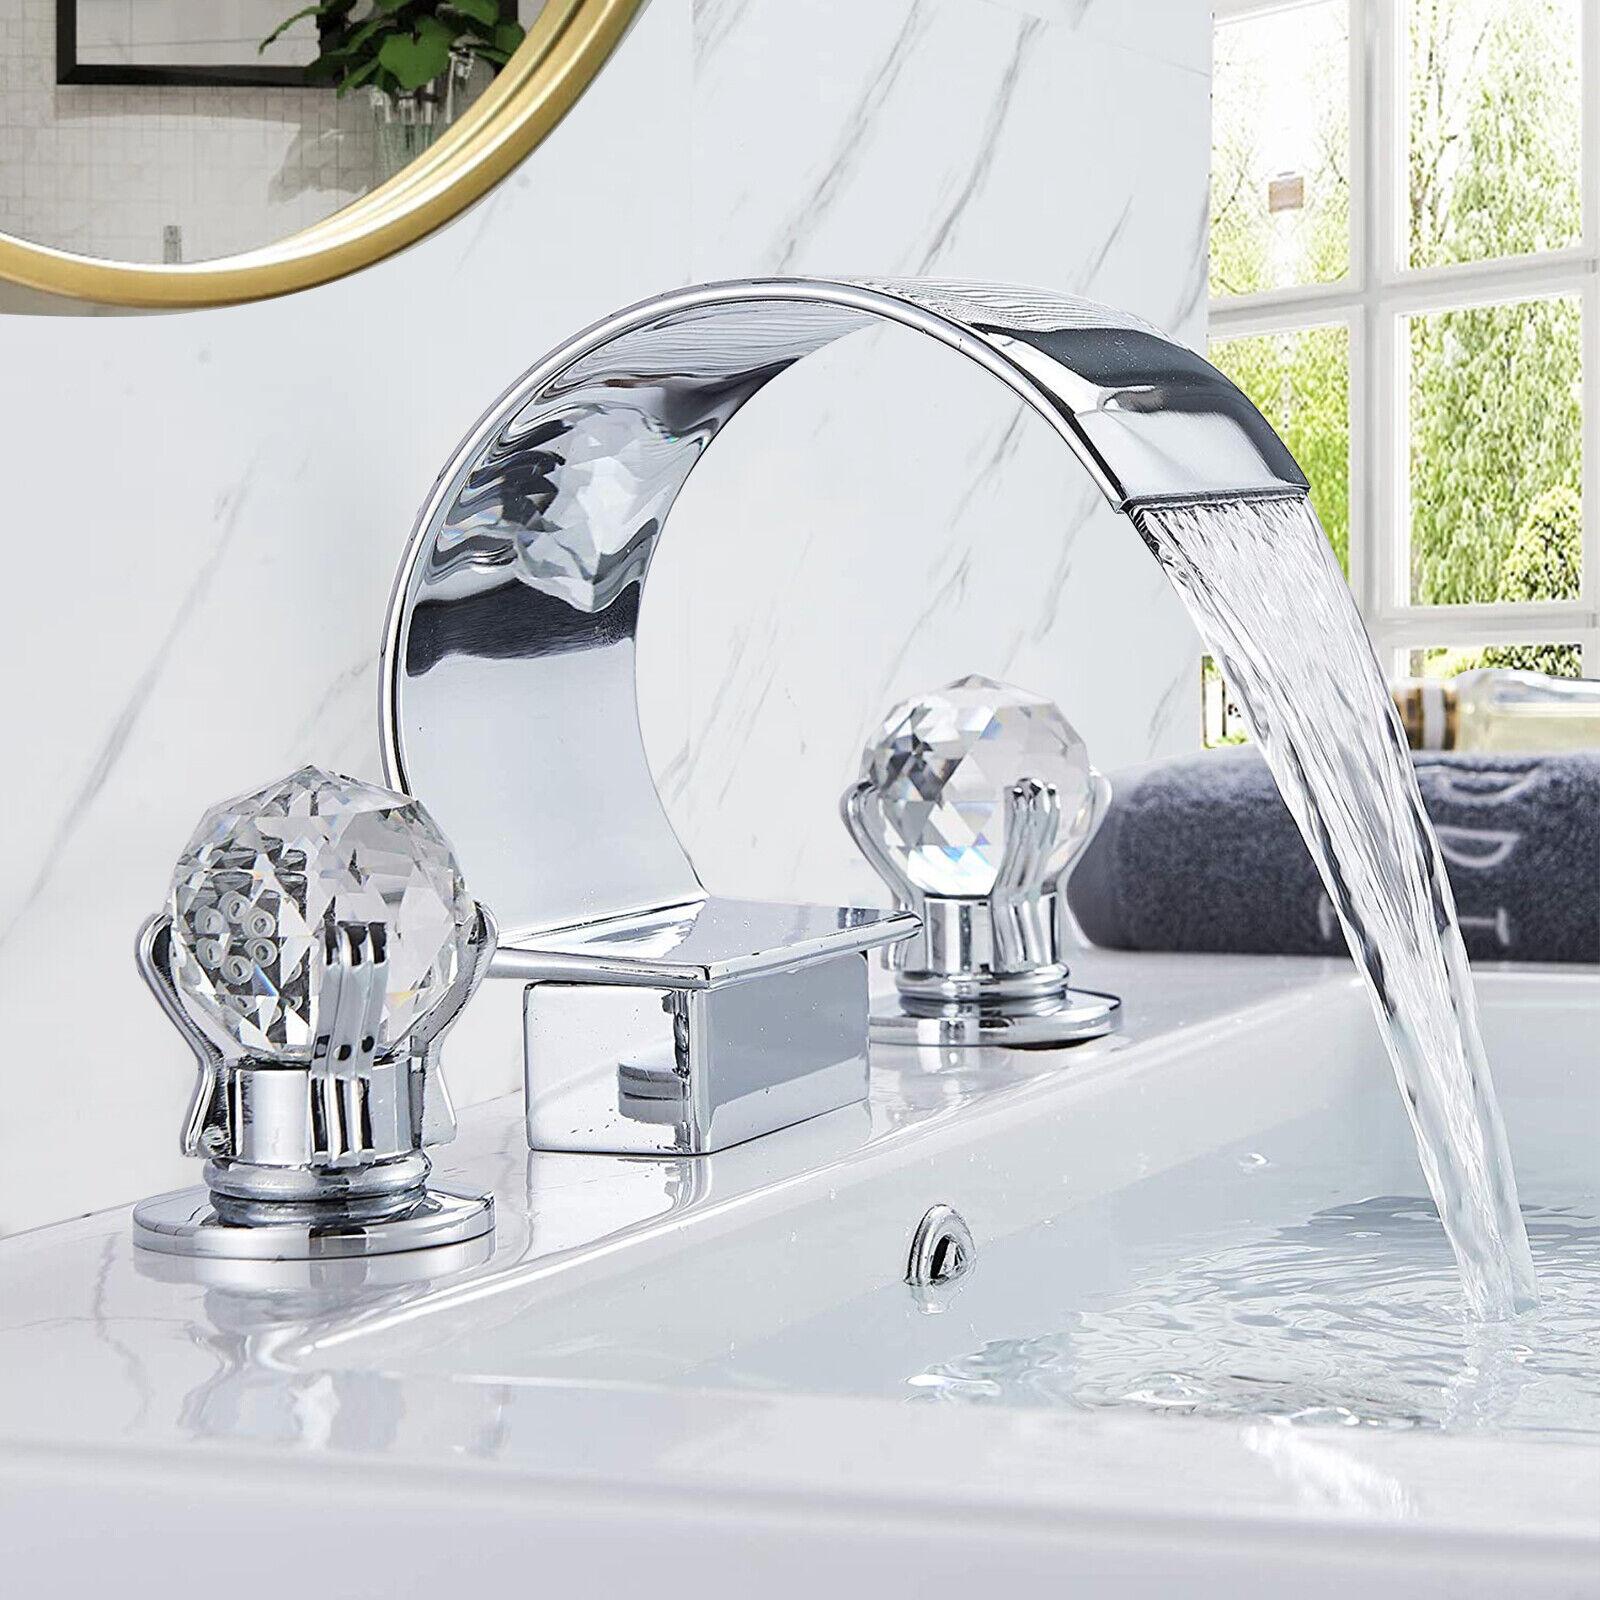 Modern Chrome Waterfall Bathroom Sink Faucet Brass Dual Crystal Handle Mixer Tap Ebay